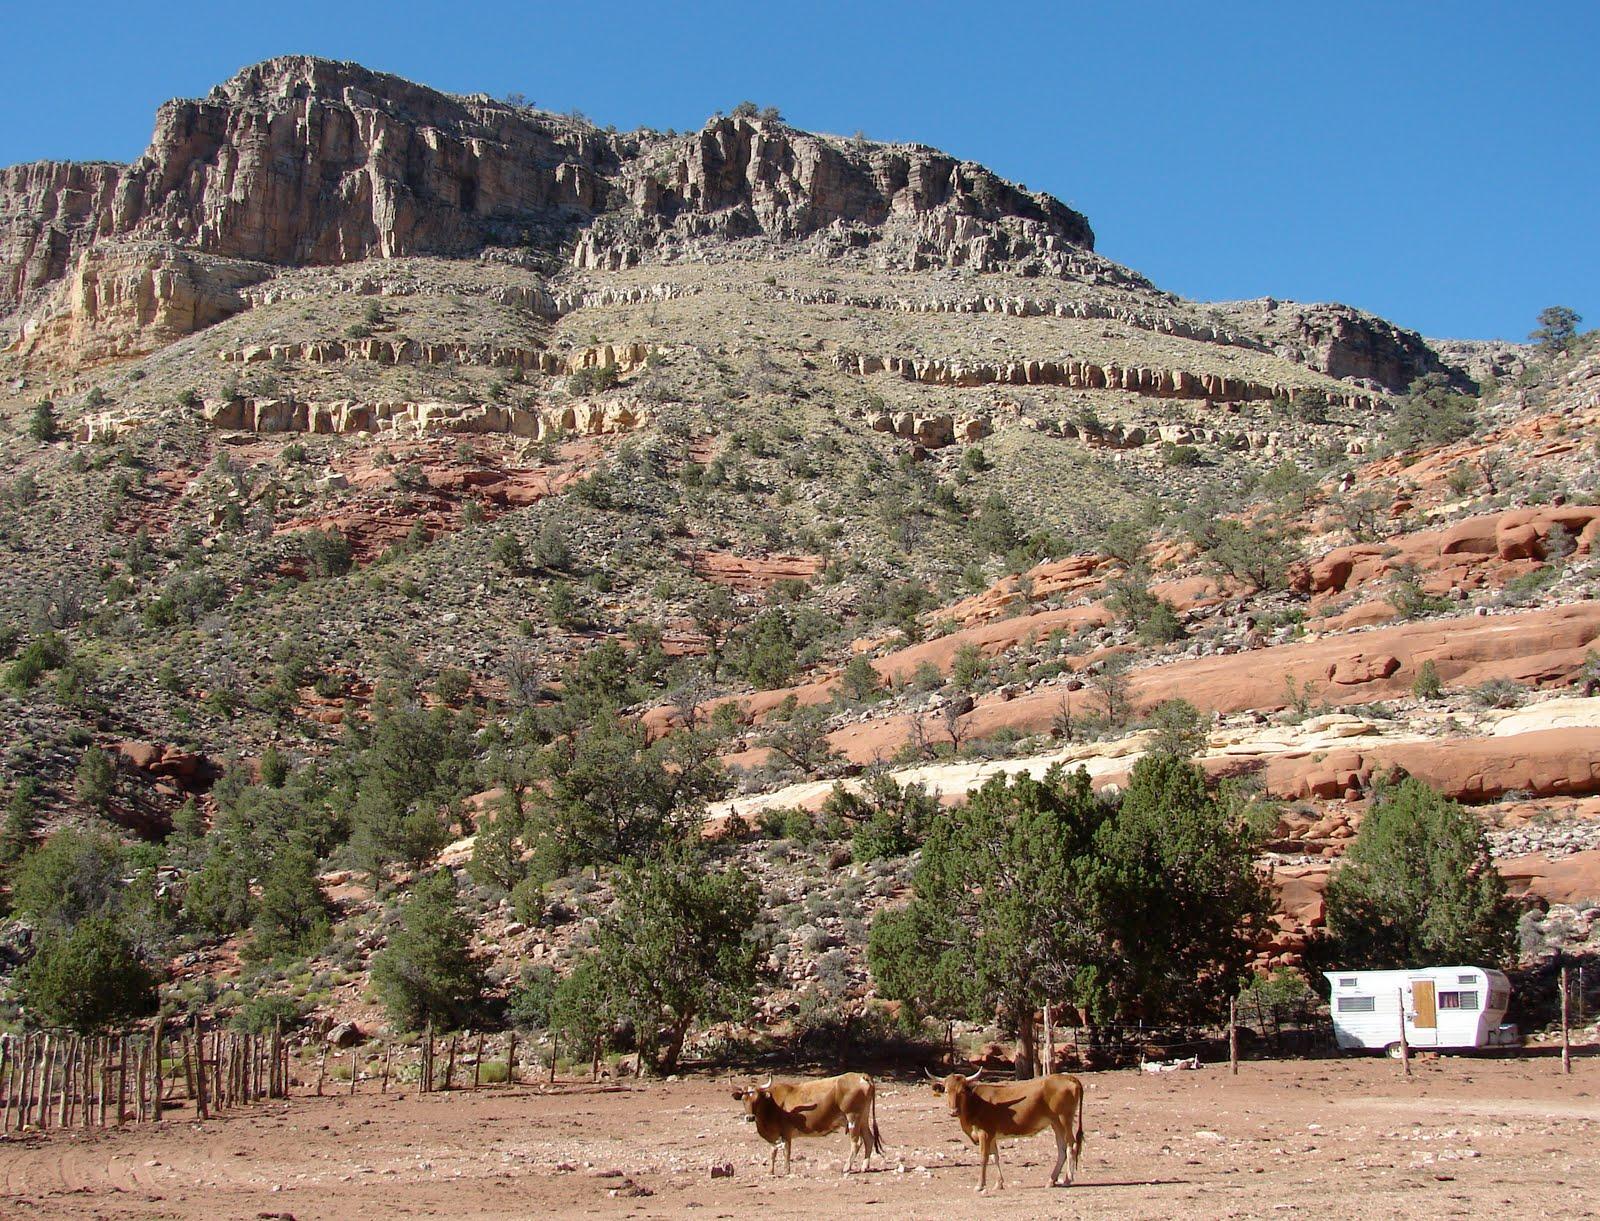 Our Four Wheel Camper Return To The Arizona Strip Pt 2